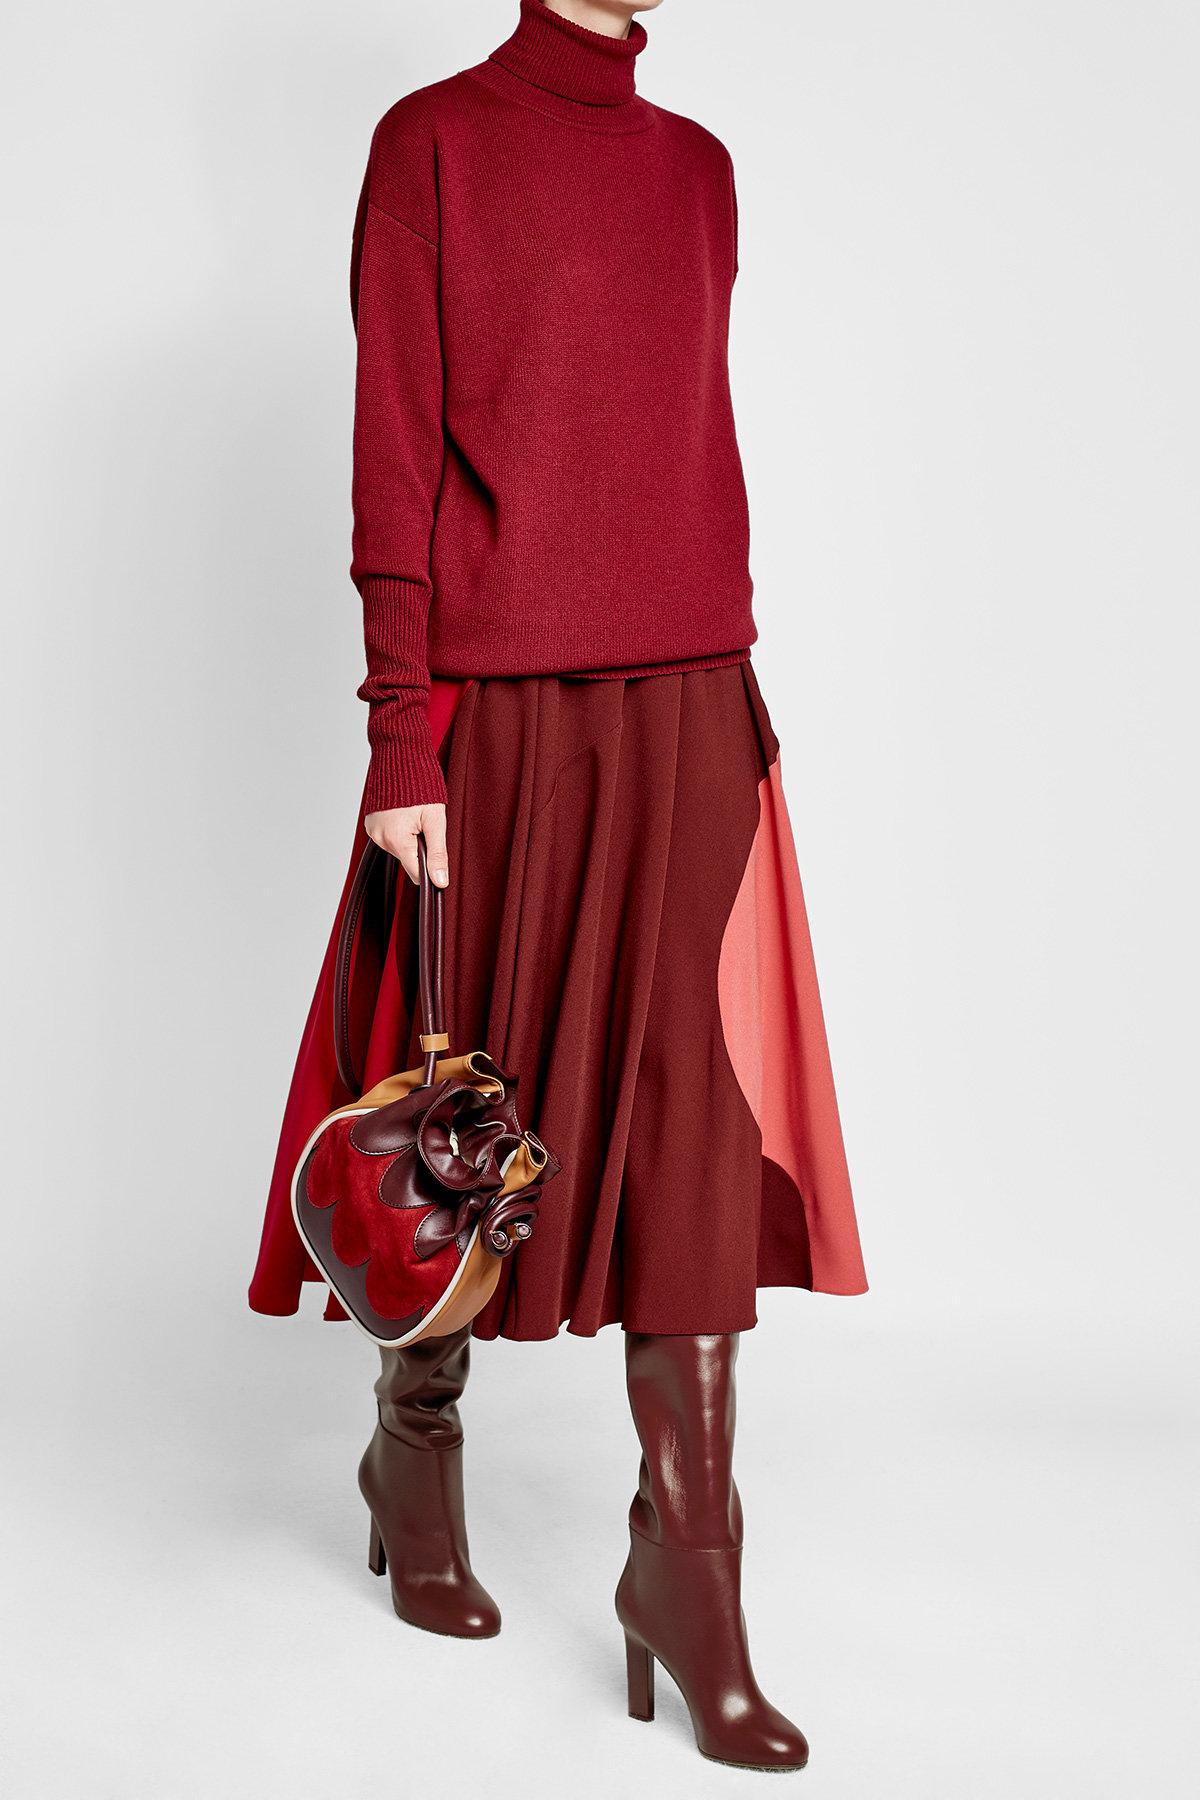 Victoria Beckham burgundy knee high boots sweater marni bag roksanda midi skirt